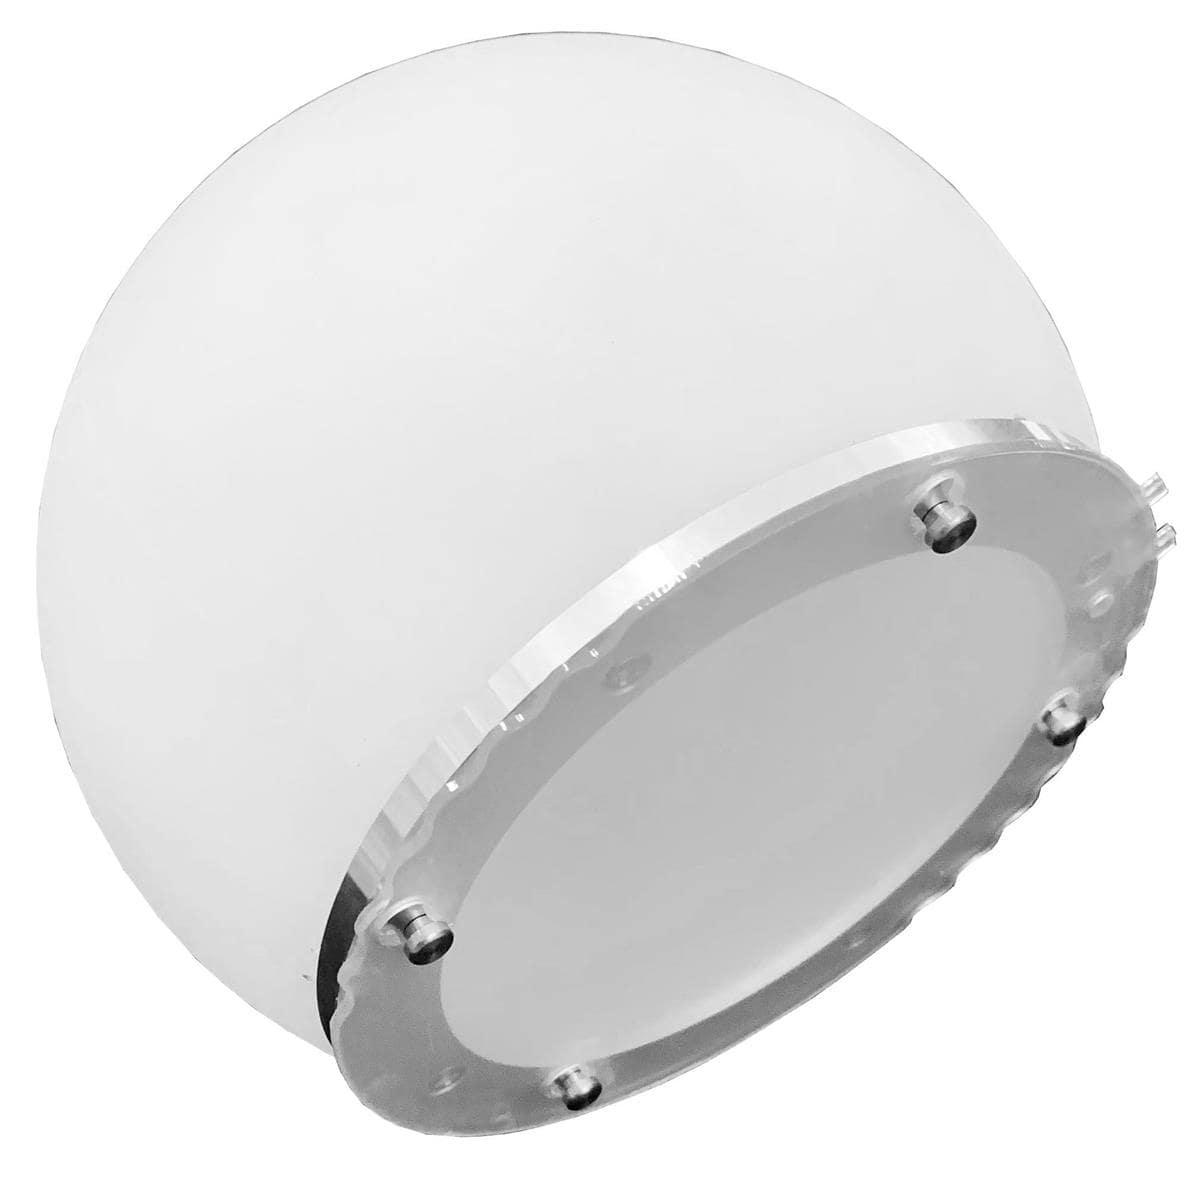 Astera AX5-DDM Diffuser Dome (25cm diameter)